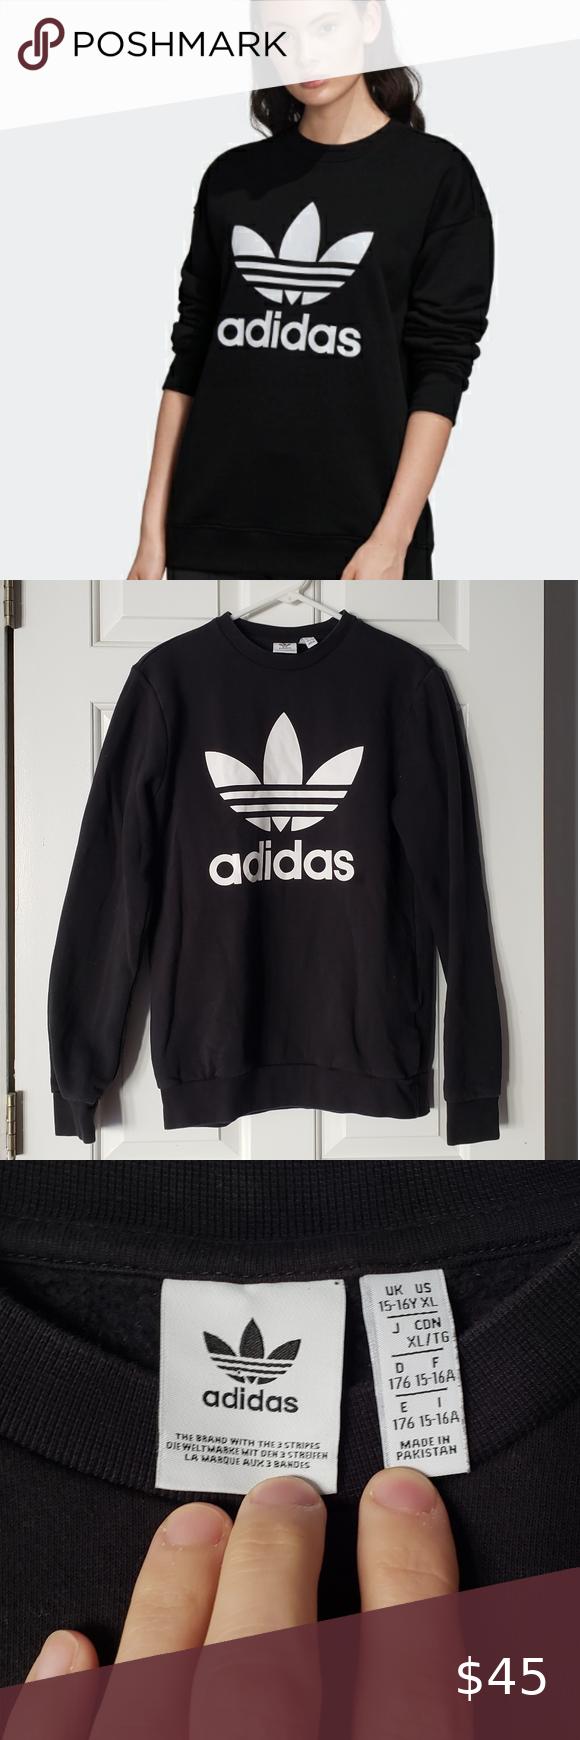 Adidas Trefoil Crew Sweatshirt Black And White Like New Adidas Trefoil Crew Sweatshirt Black And White Smoke Black Sweatshirts Crew Sweatshirts Adidas Trefoil [ 1740 x 580 Pixel ]